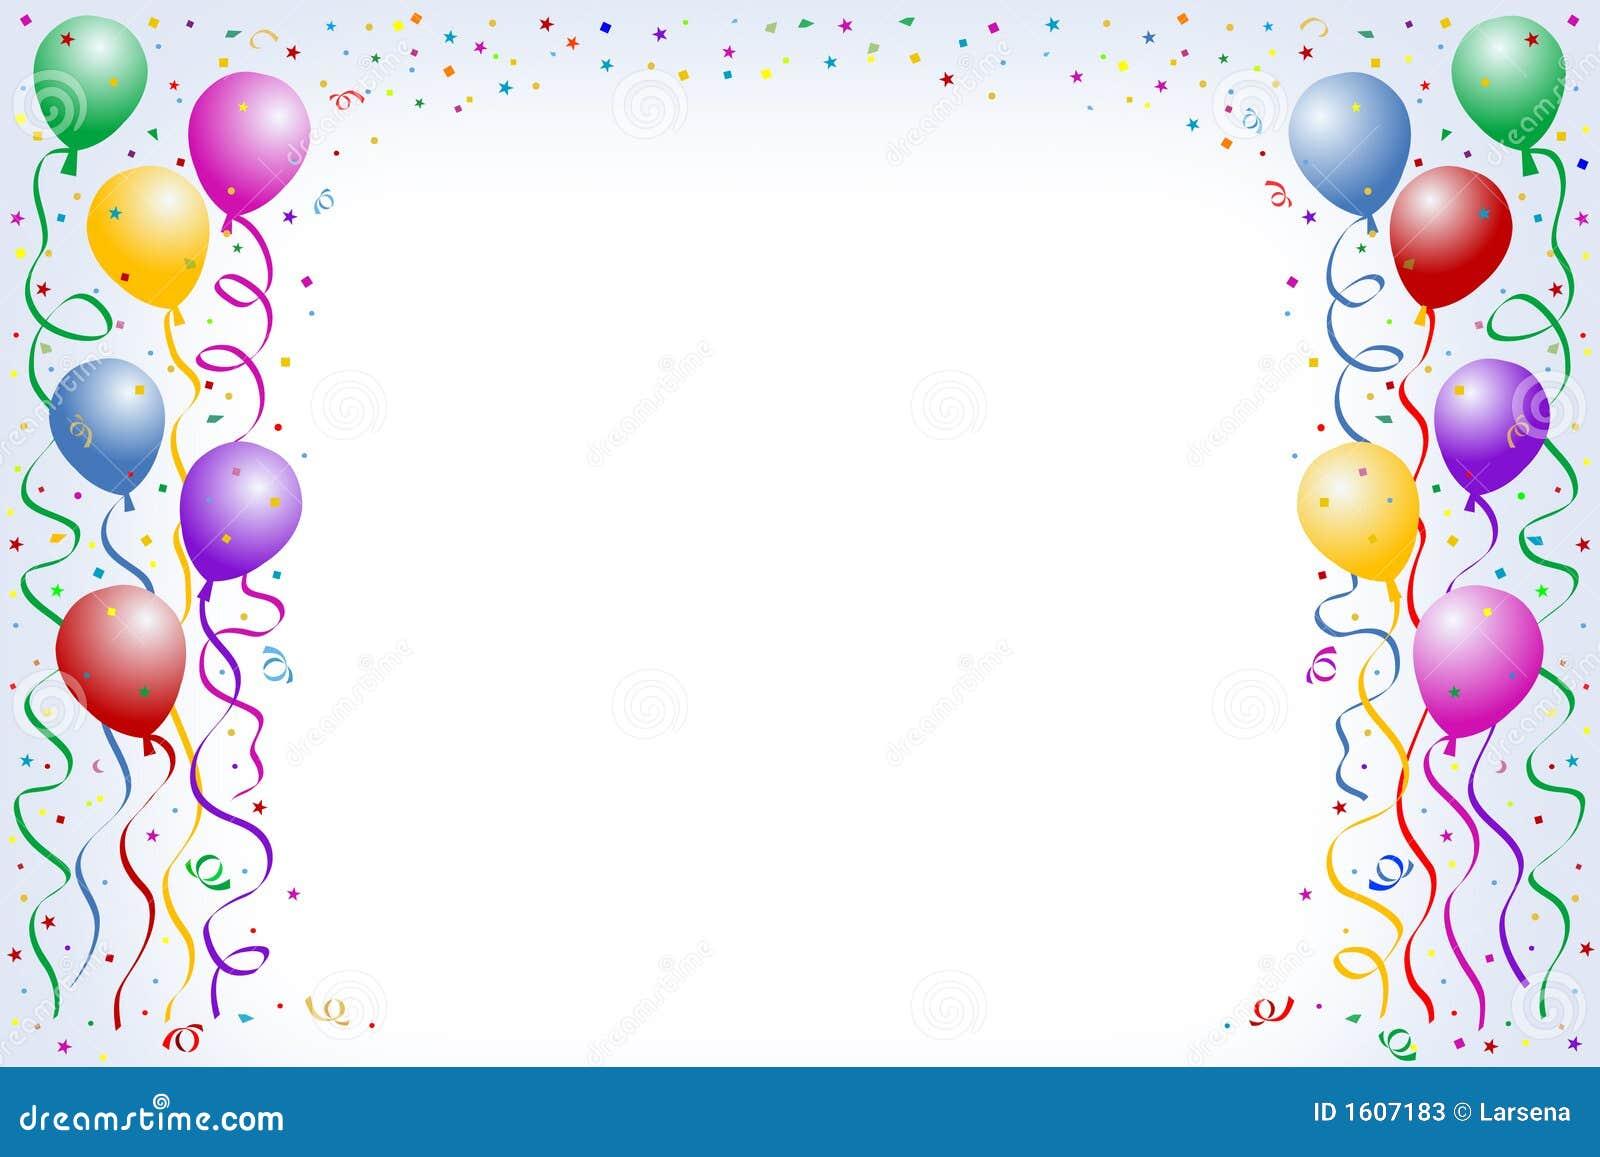 Stock Photos Balloons Confetti Image1607183 on Program Borders Clip Art